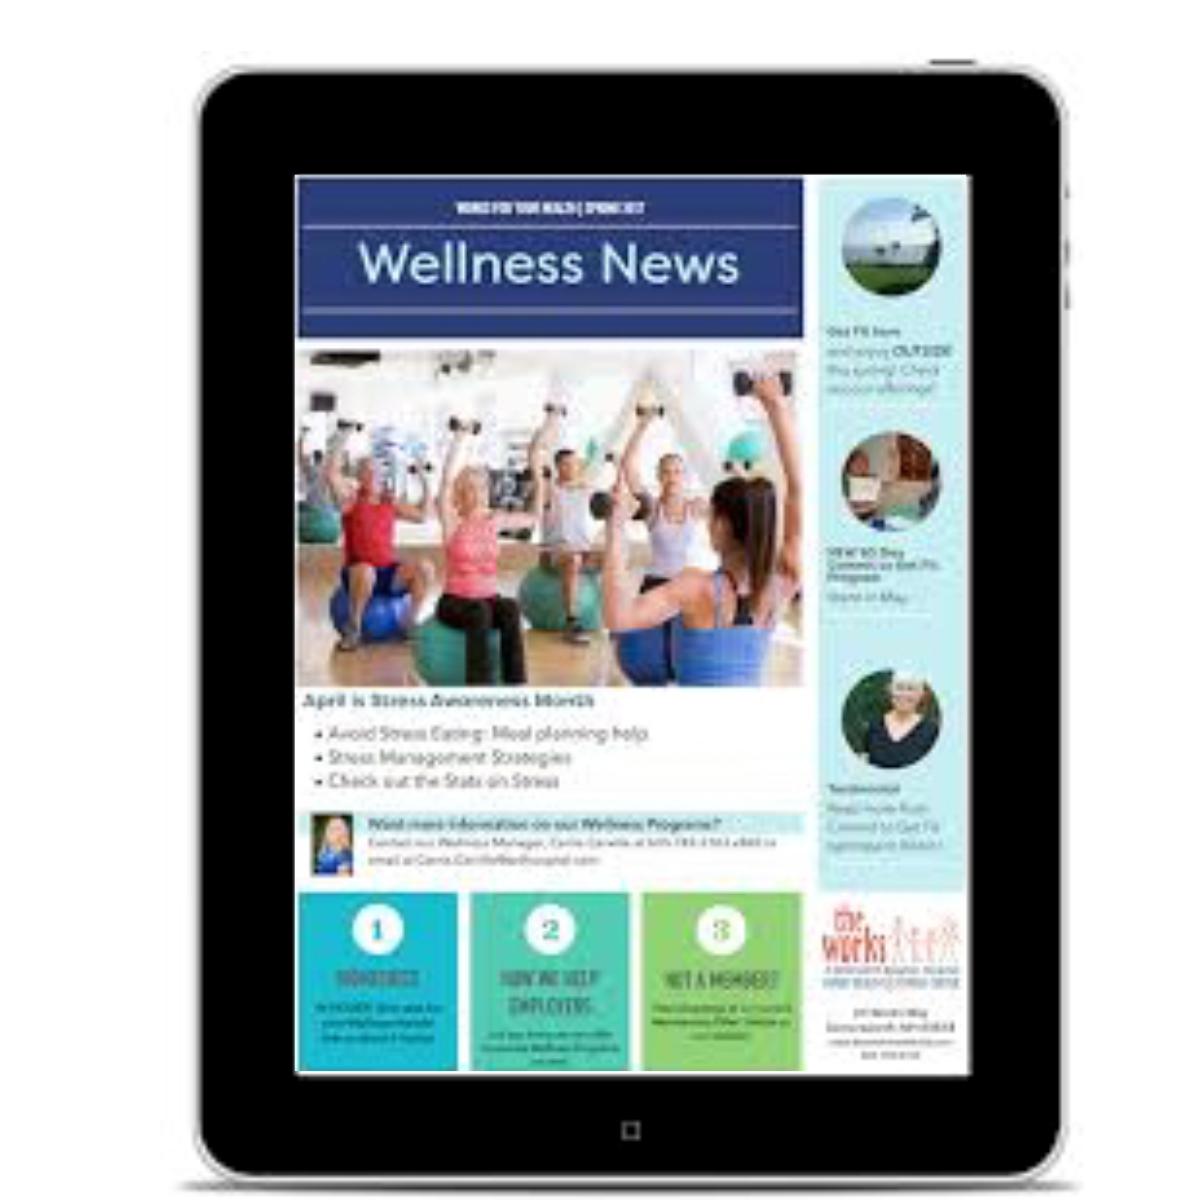 The Wellness Newsletter